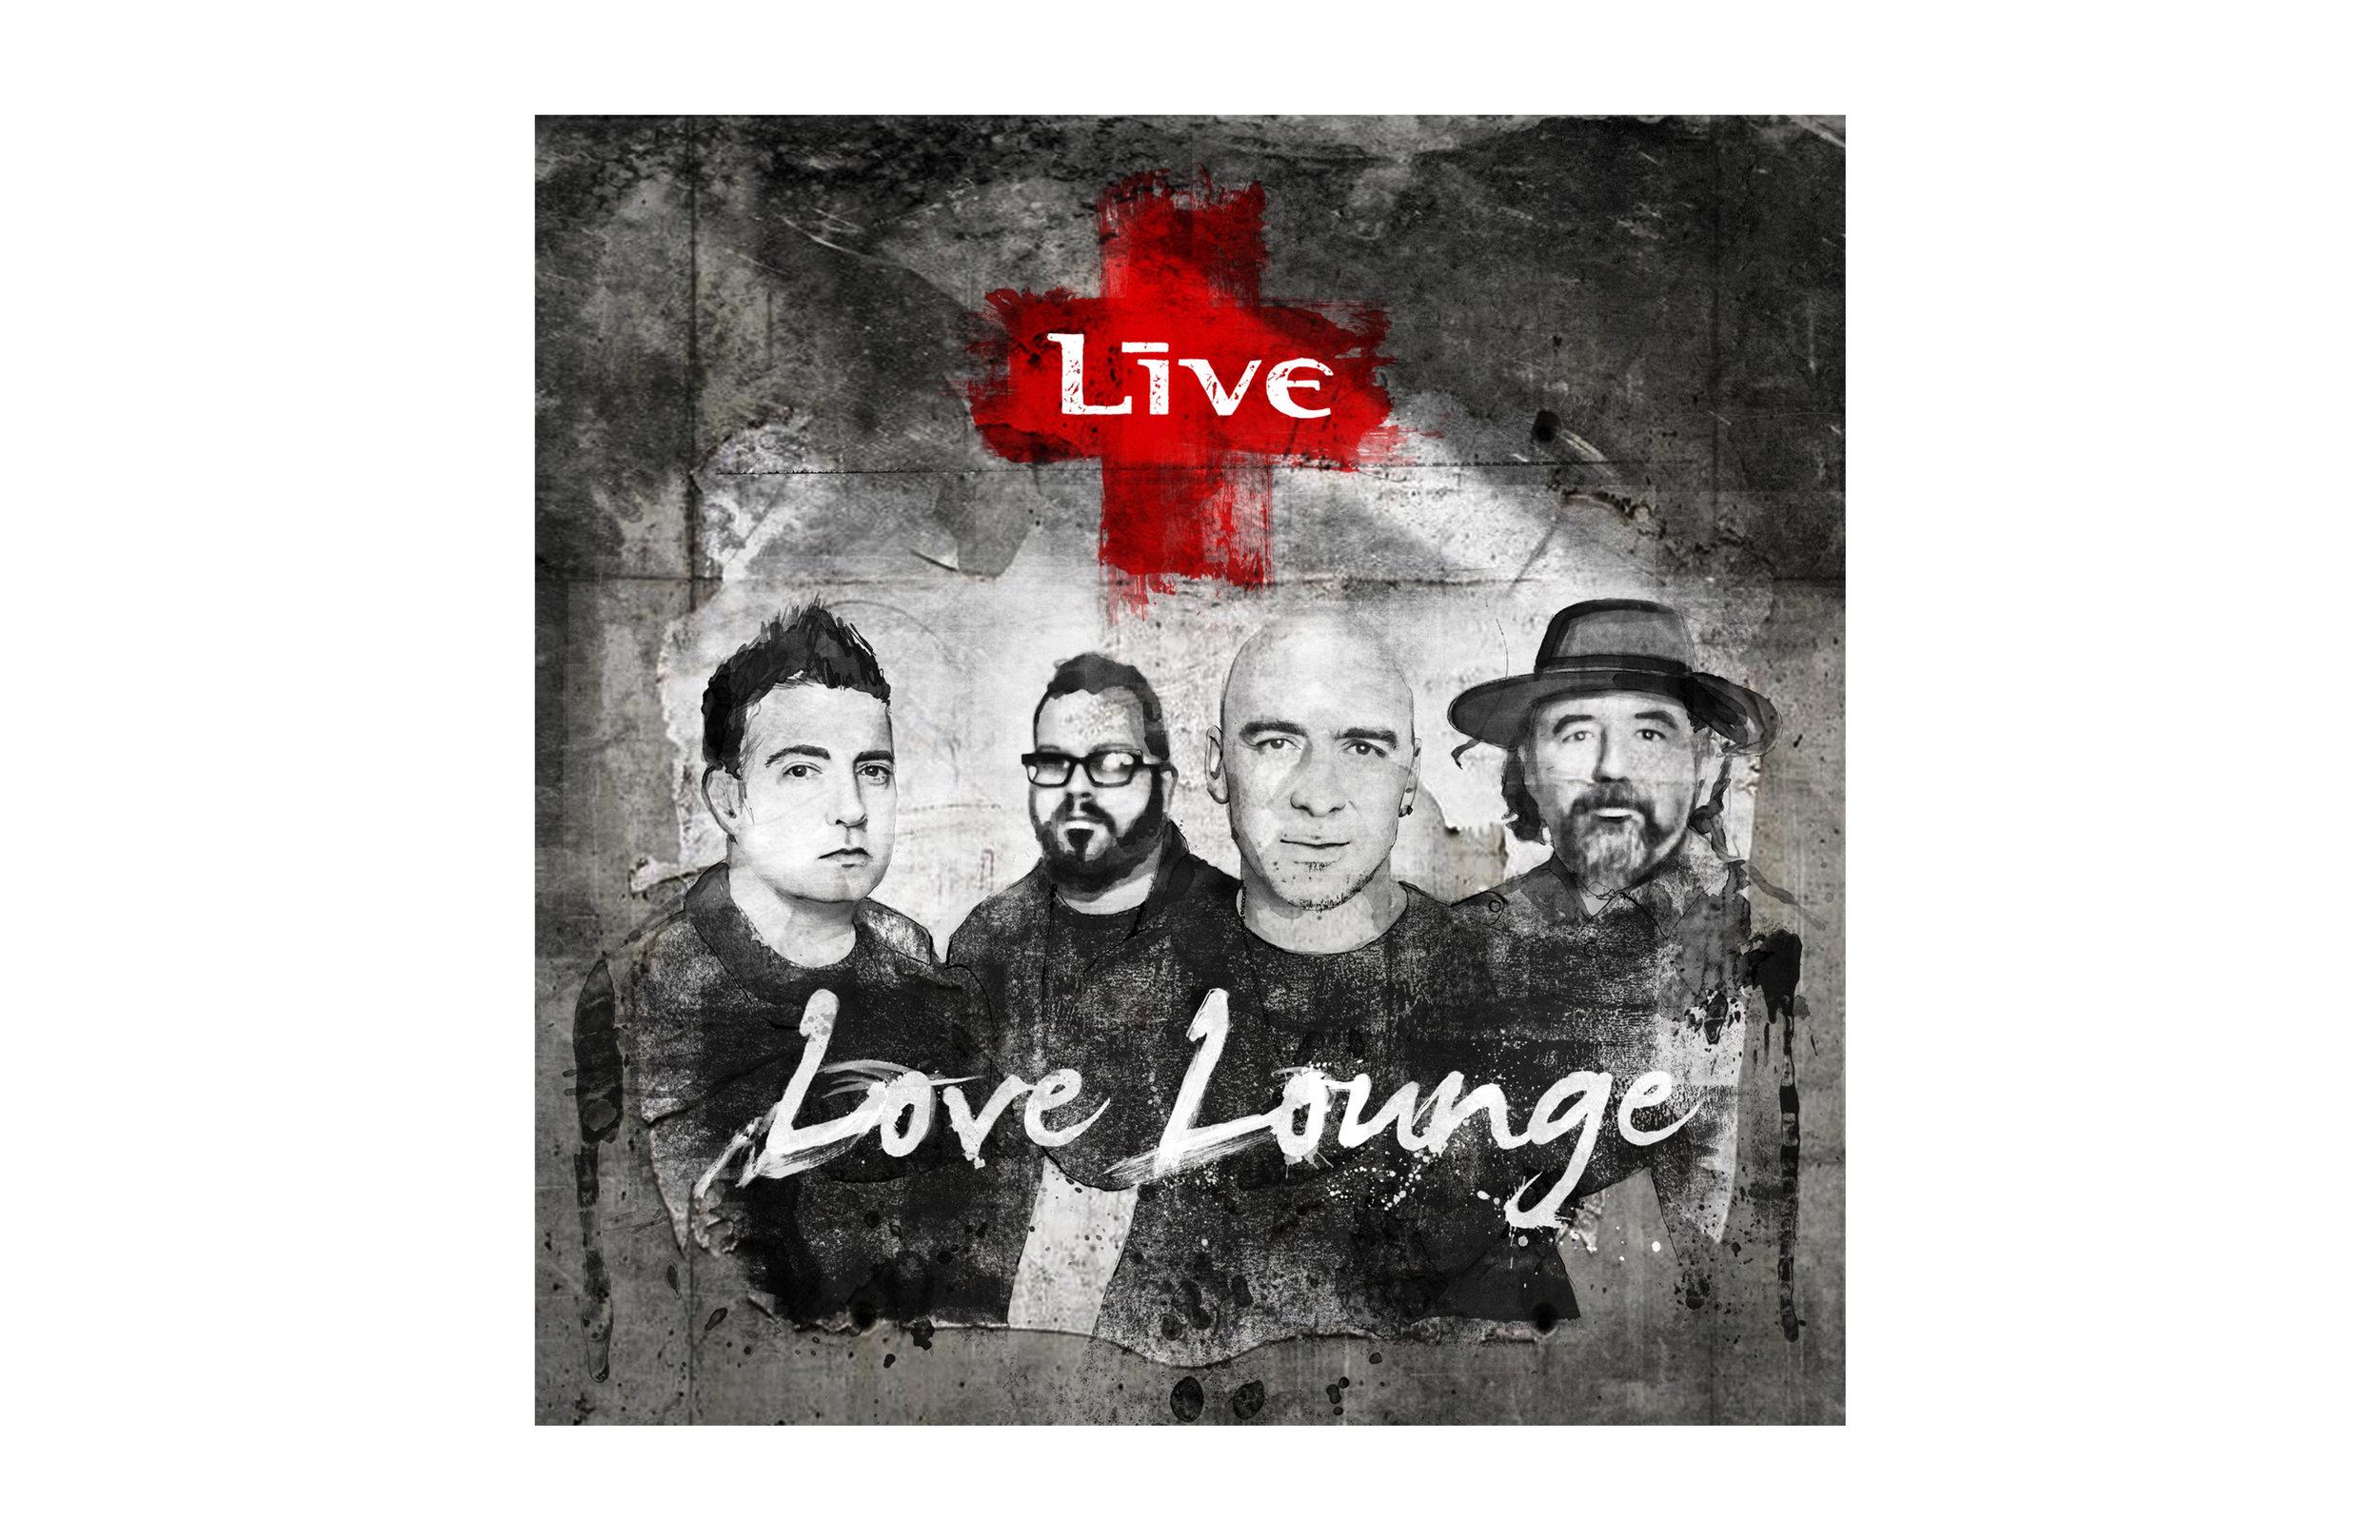 LIVE_LOVELOUNGE_KNEESLAPPA.jpg